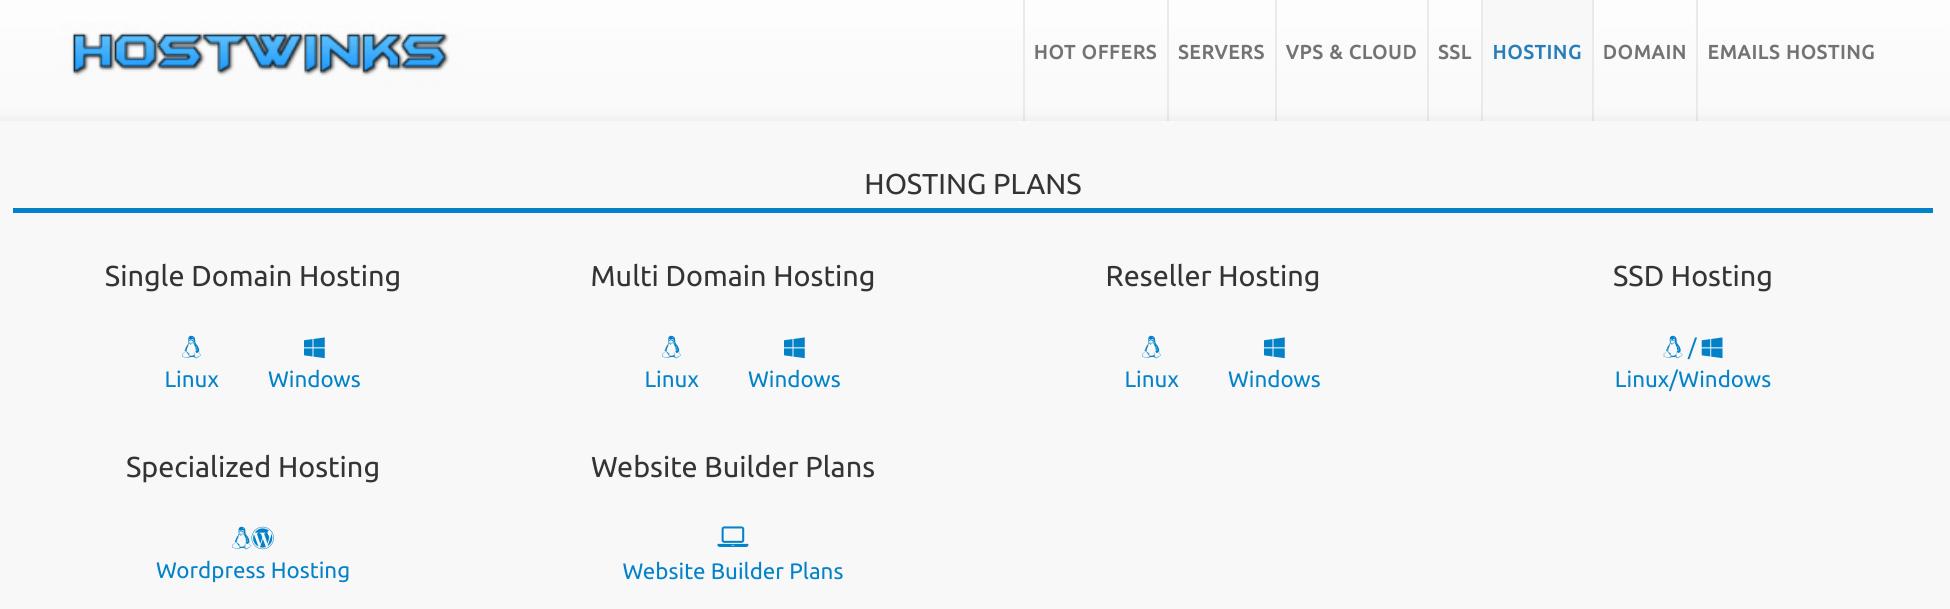 HostWinks